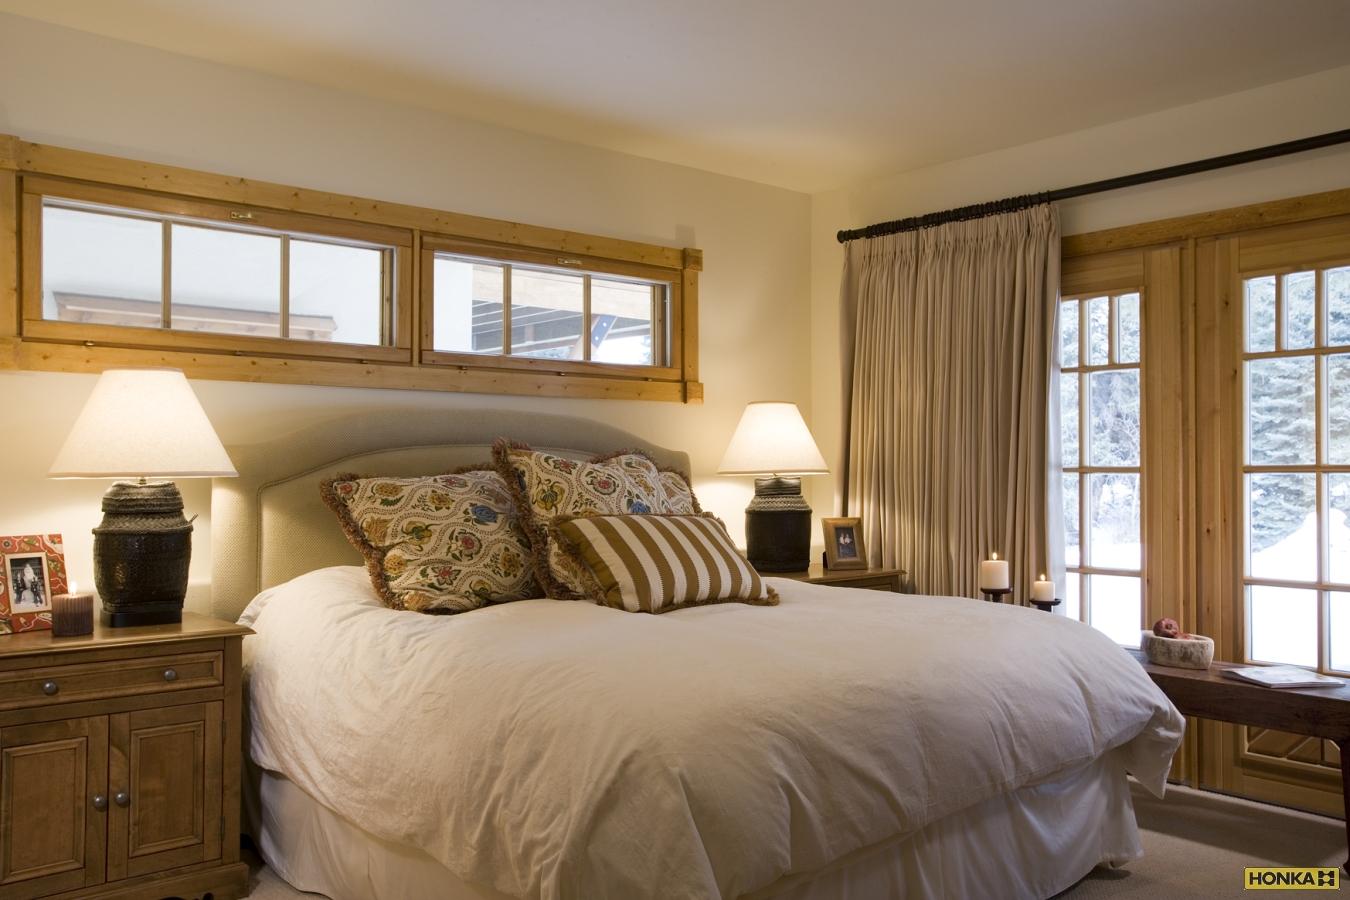 Eagle River интерьер спальни дома из бревна